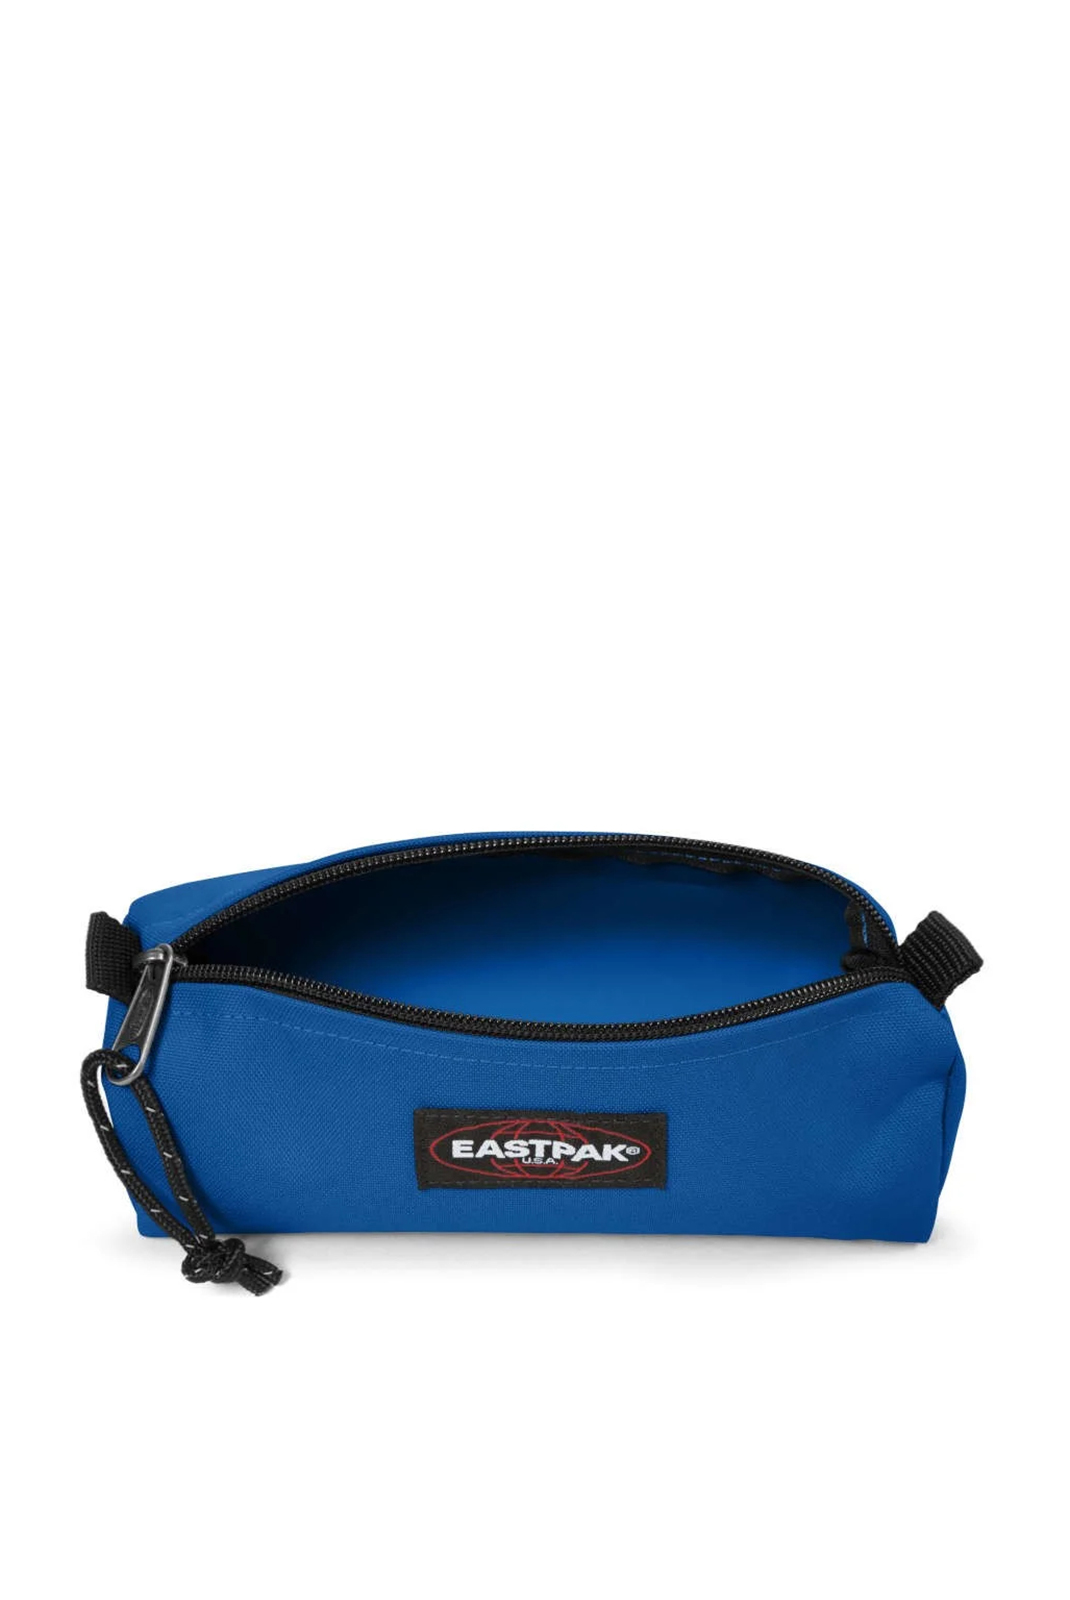 Etuis / Trousses  Eastpak EK372B57 B57 Cobalt Blue